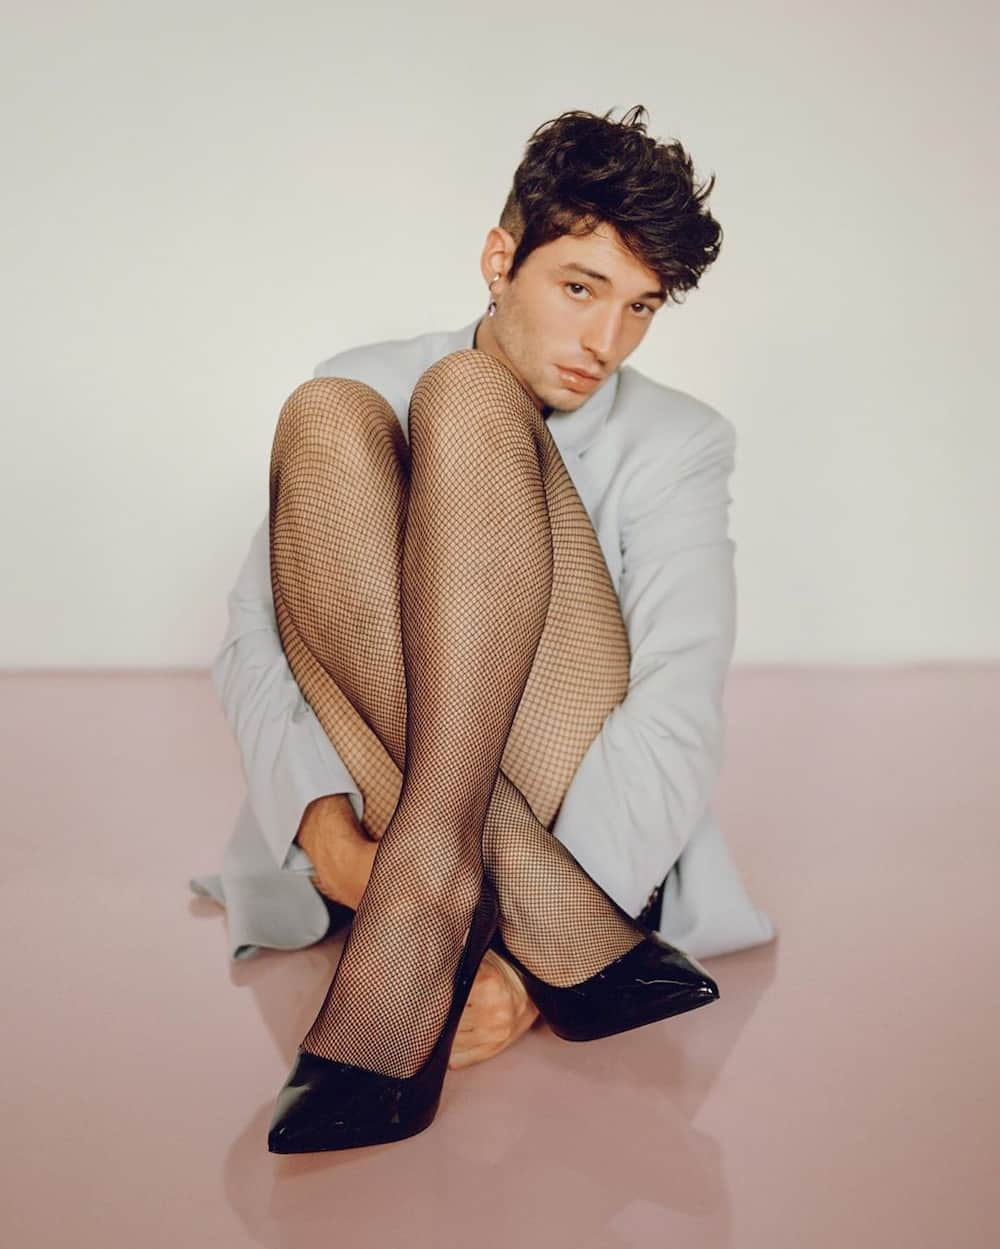 Ezra Miller sexuality